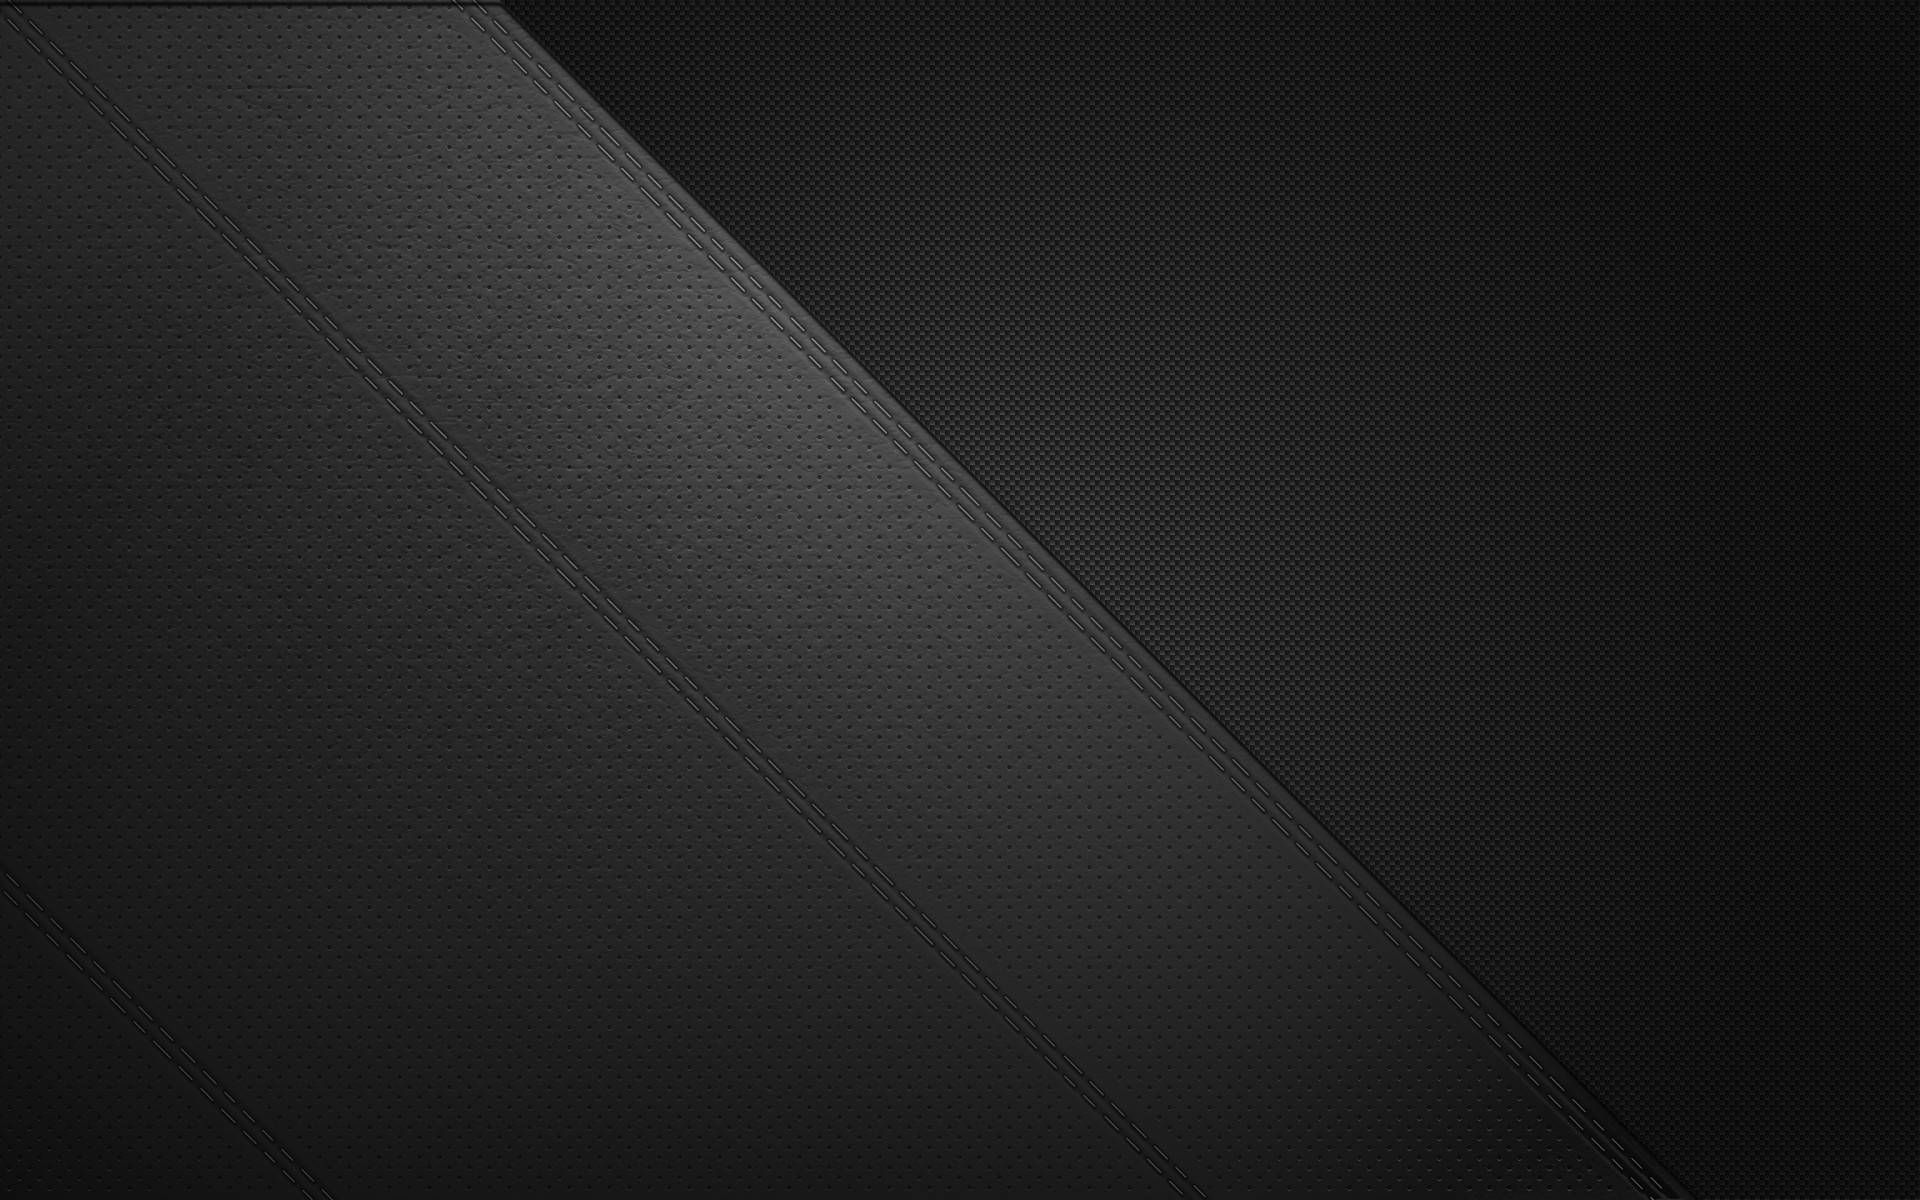 Dark Wallpaper Portrait Best Wallpaper Hd Dark Black Wallpaper Black Wallpaper Pure Black Wallpaper